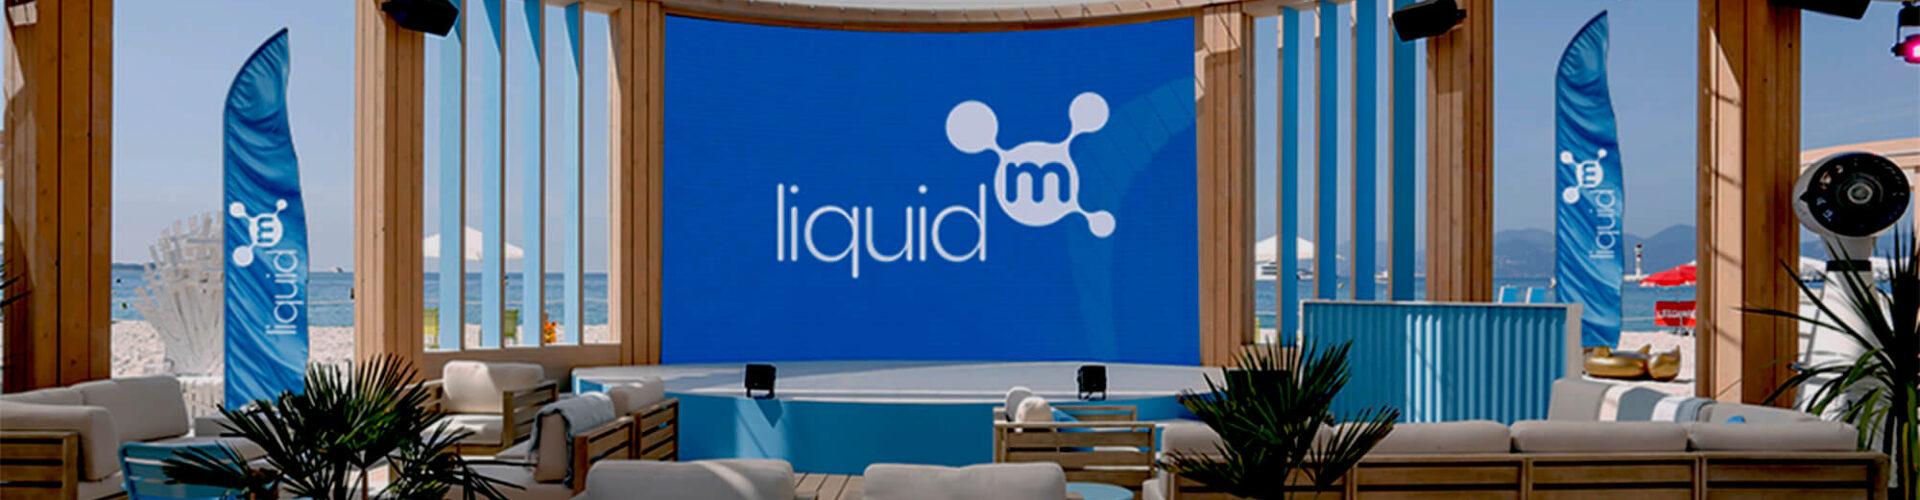 Summer Adtech Virtual Event with LiquidM